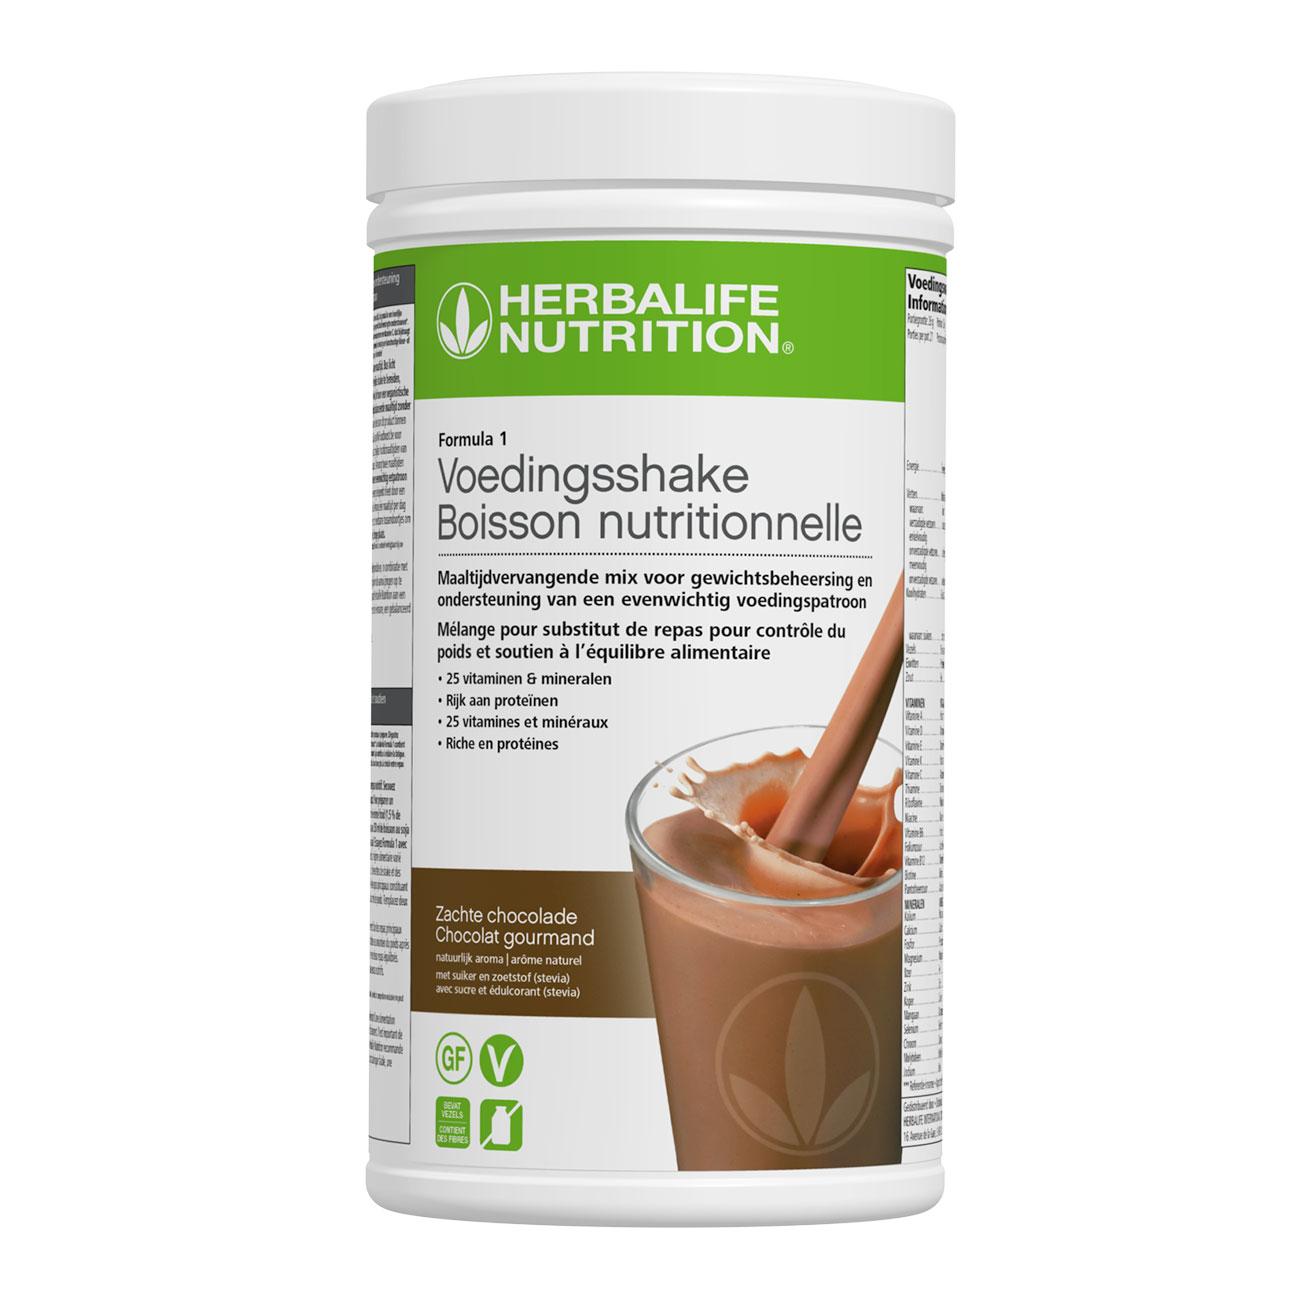 Formula 1 Substitut de repas Chocolat gourmand 550g